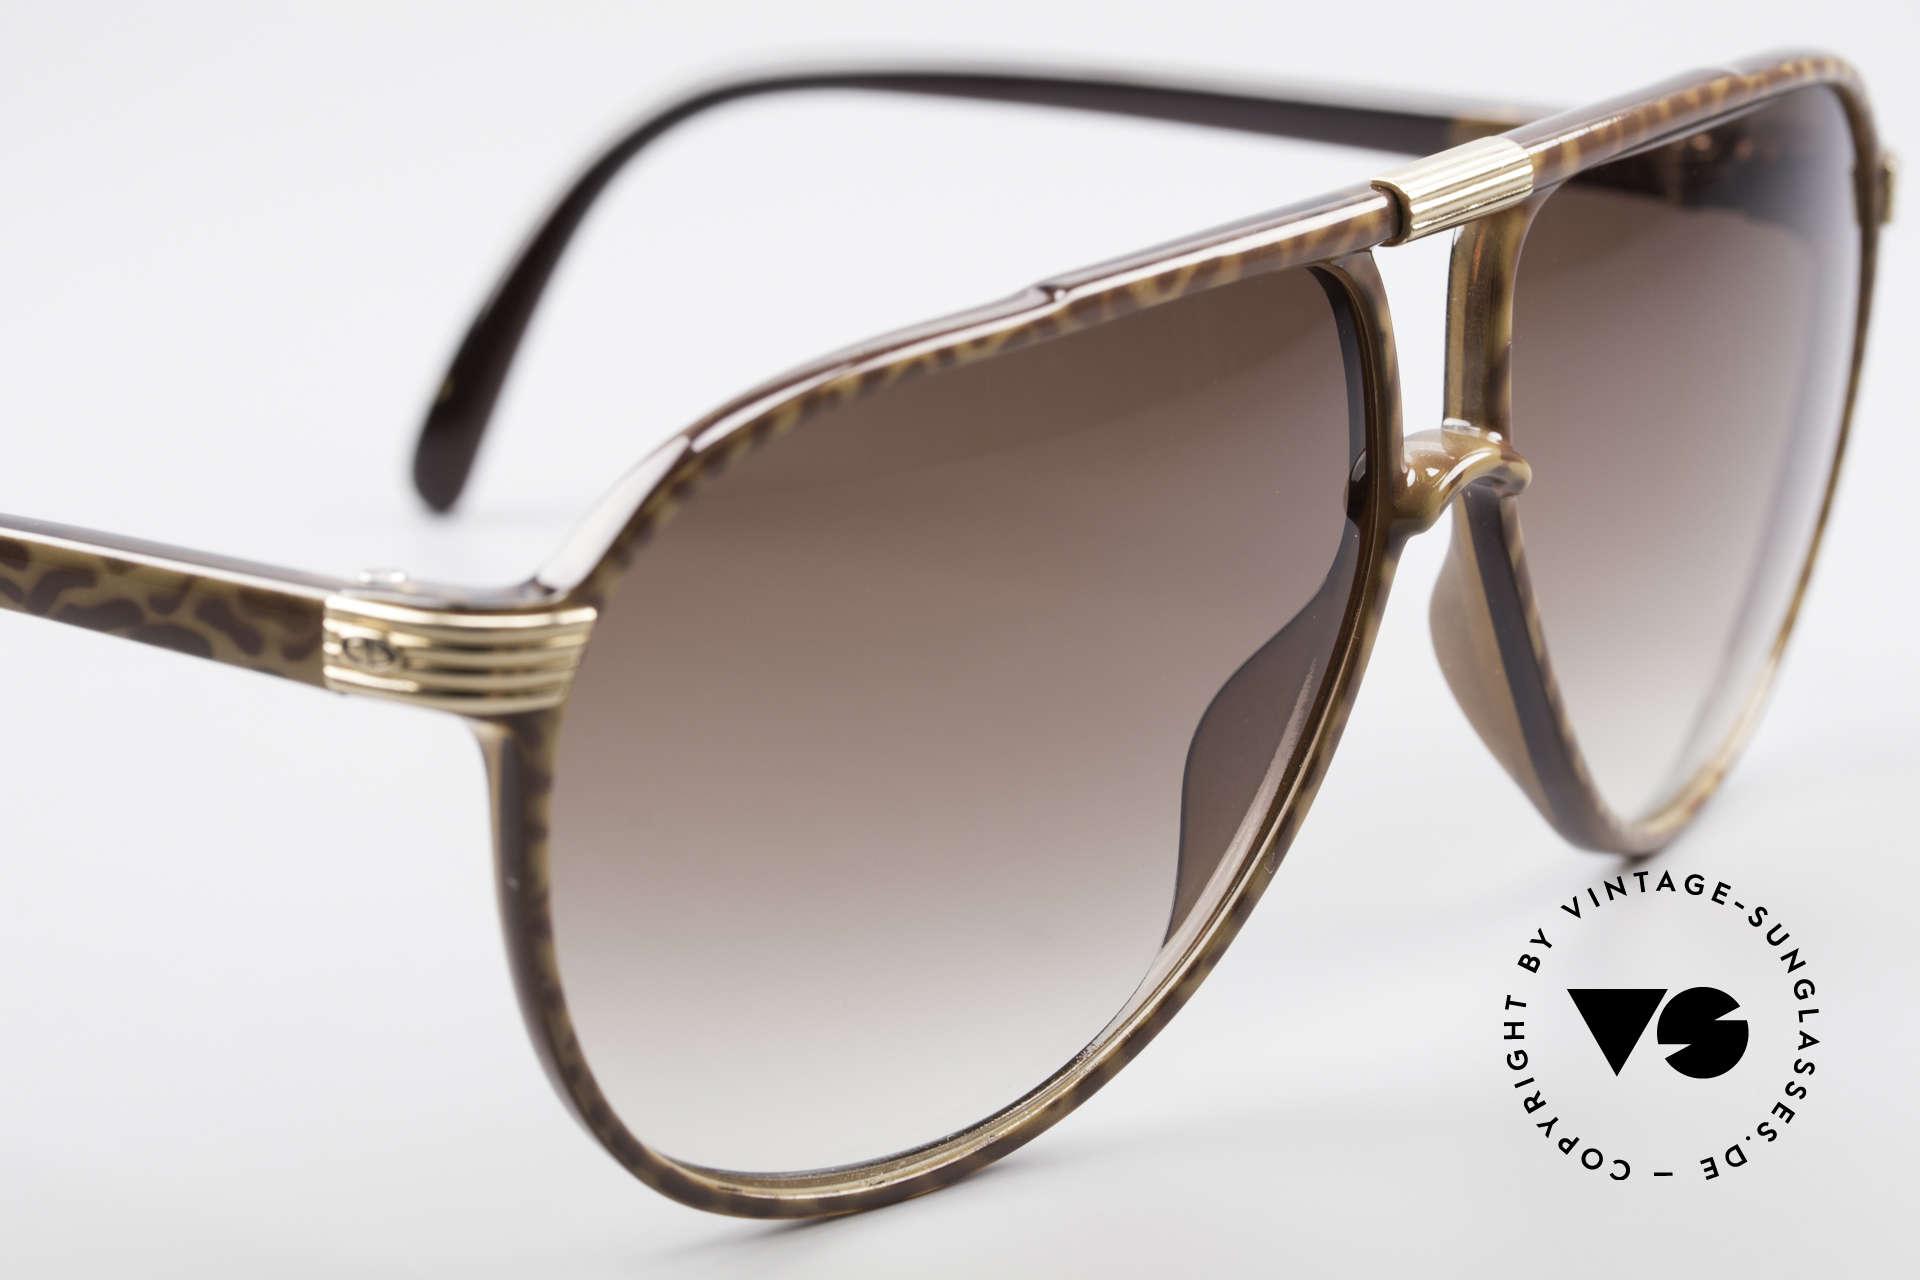 Christian Dior 2300 80's Aviator Sunglasses, brown-gradient sun lenses (100% UV protection), Made for Men